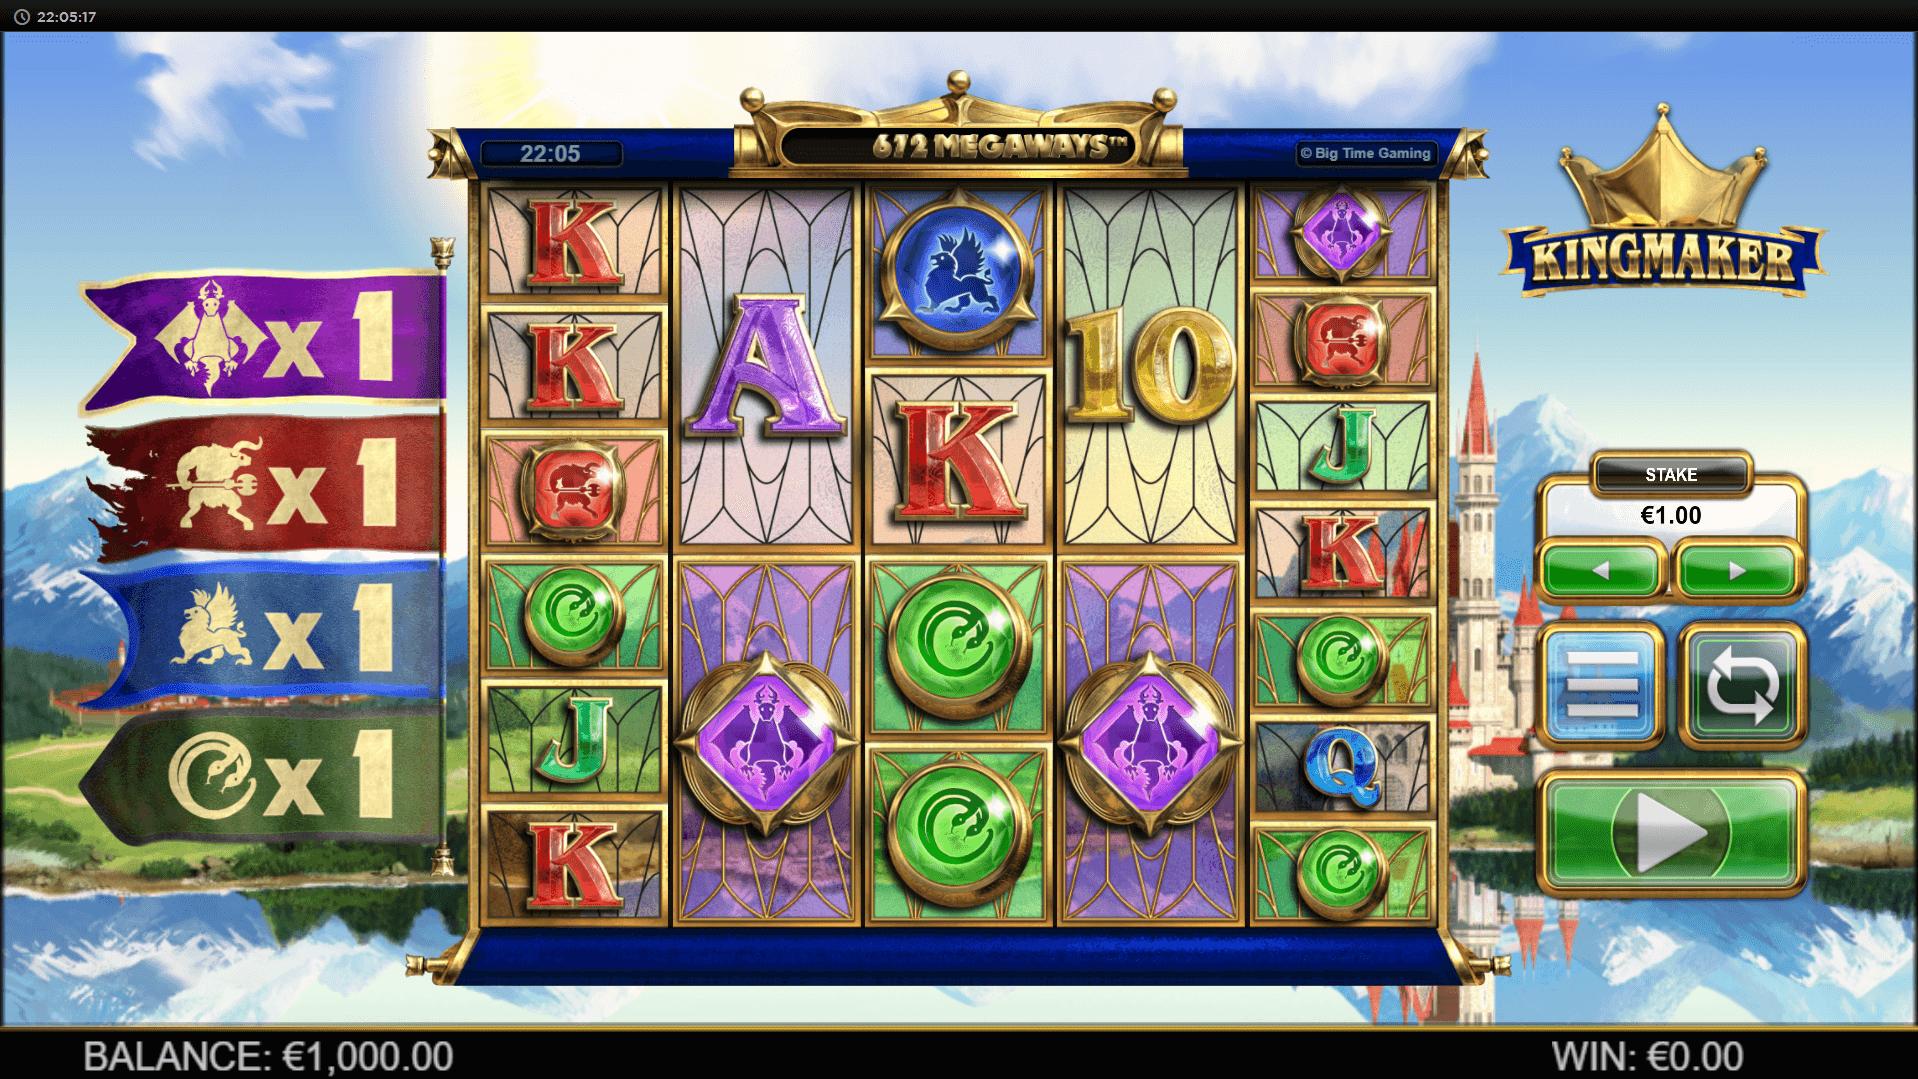 Kingmaker slot machine screenshot